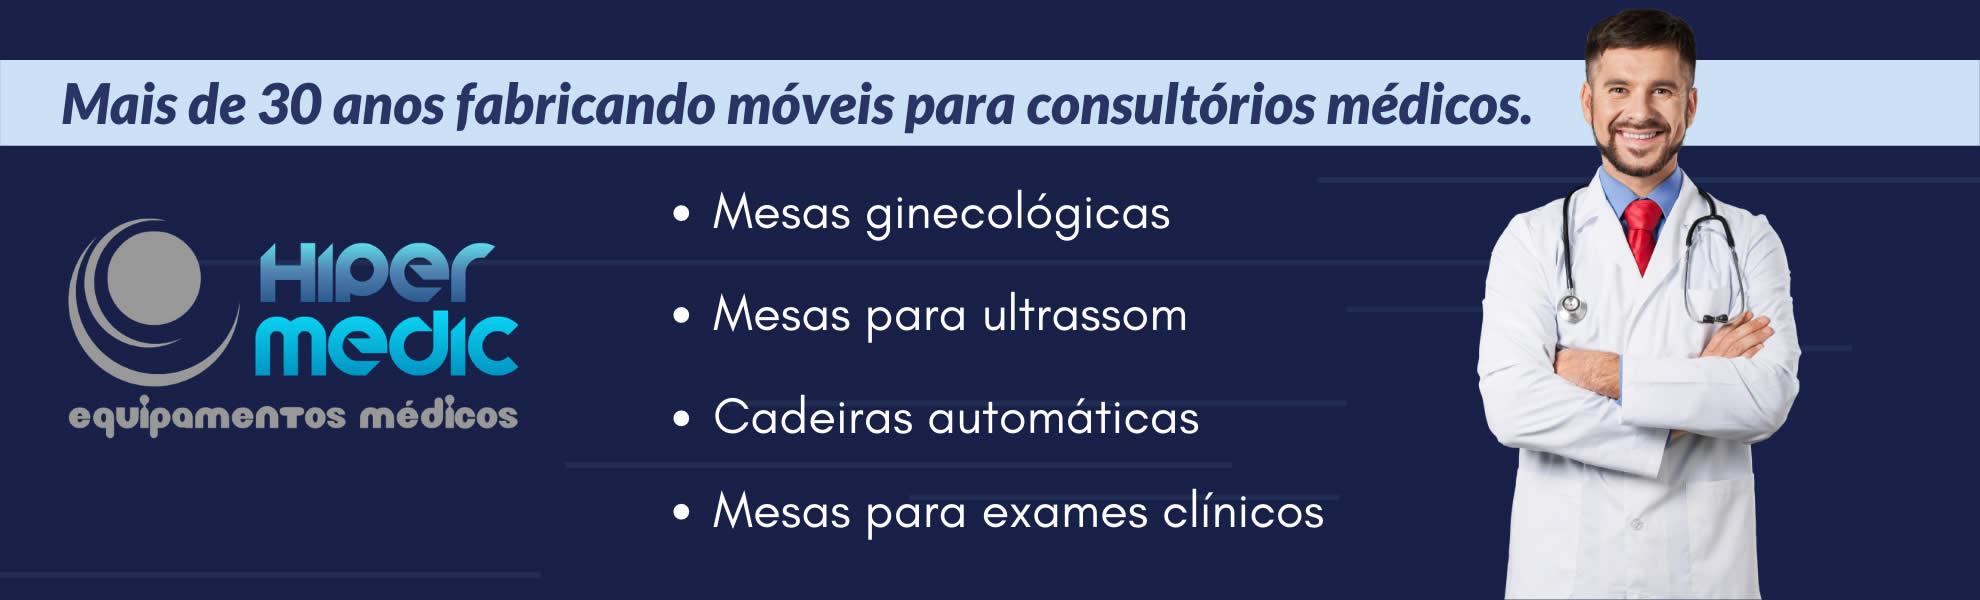 Hipermedic (1)